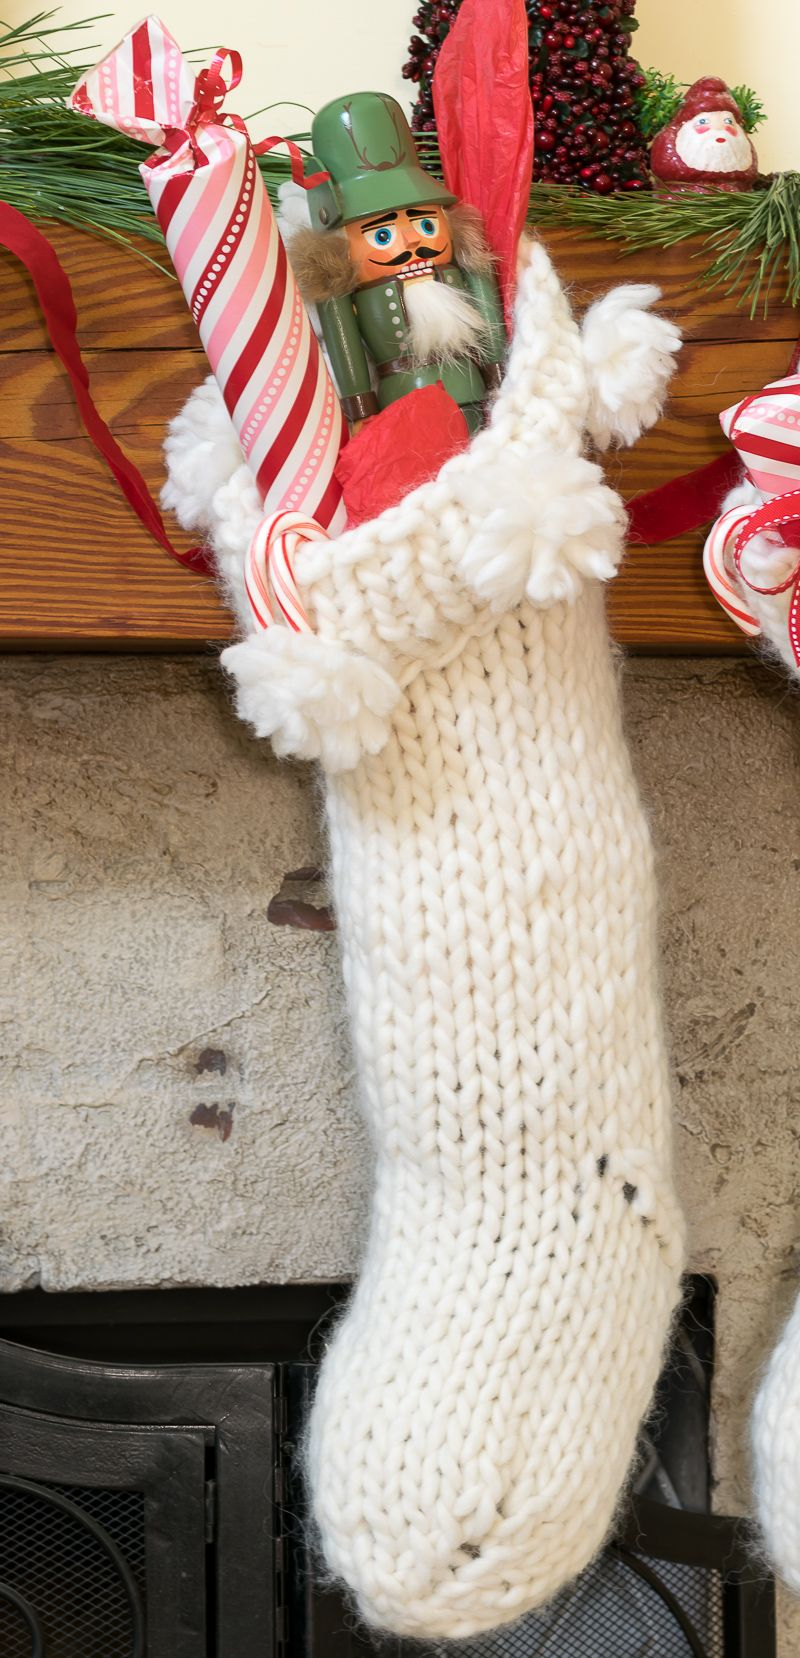 Chunky Knit Christmas Stocking Pattern   Chunky yarn, Knitted ...